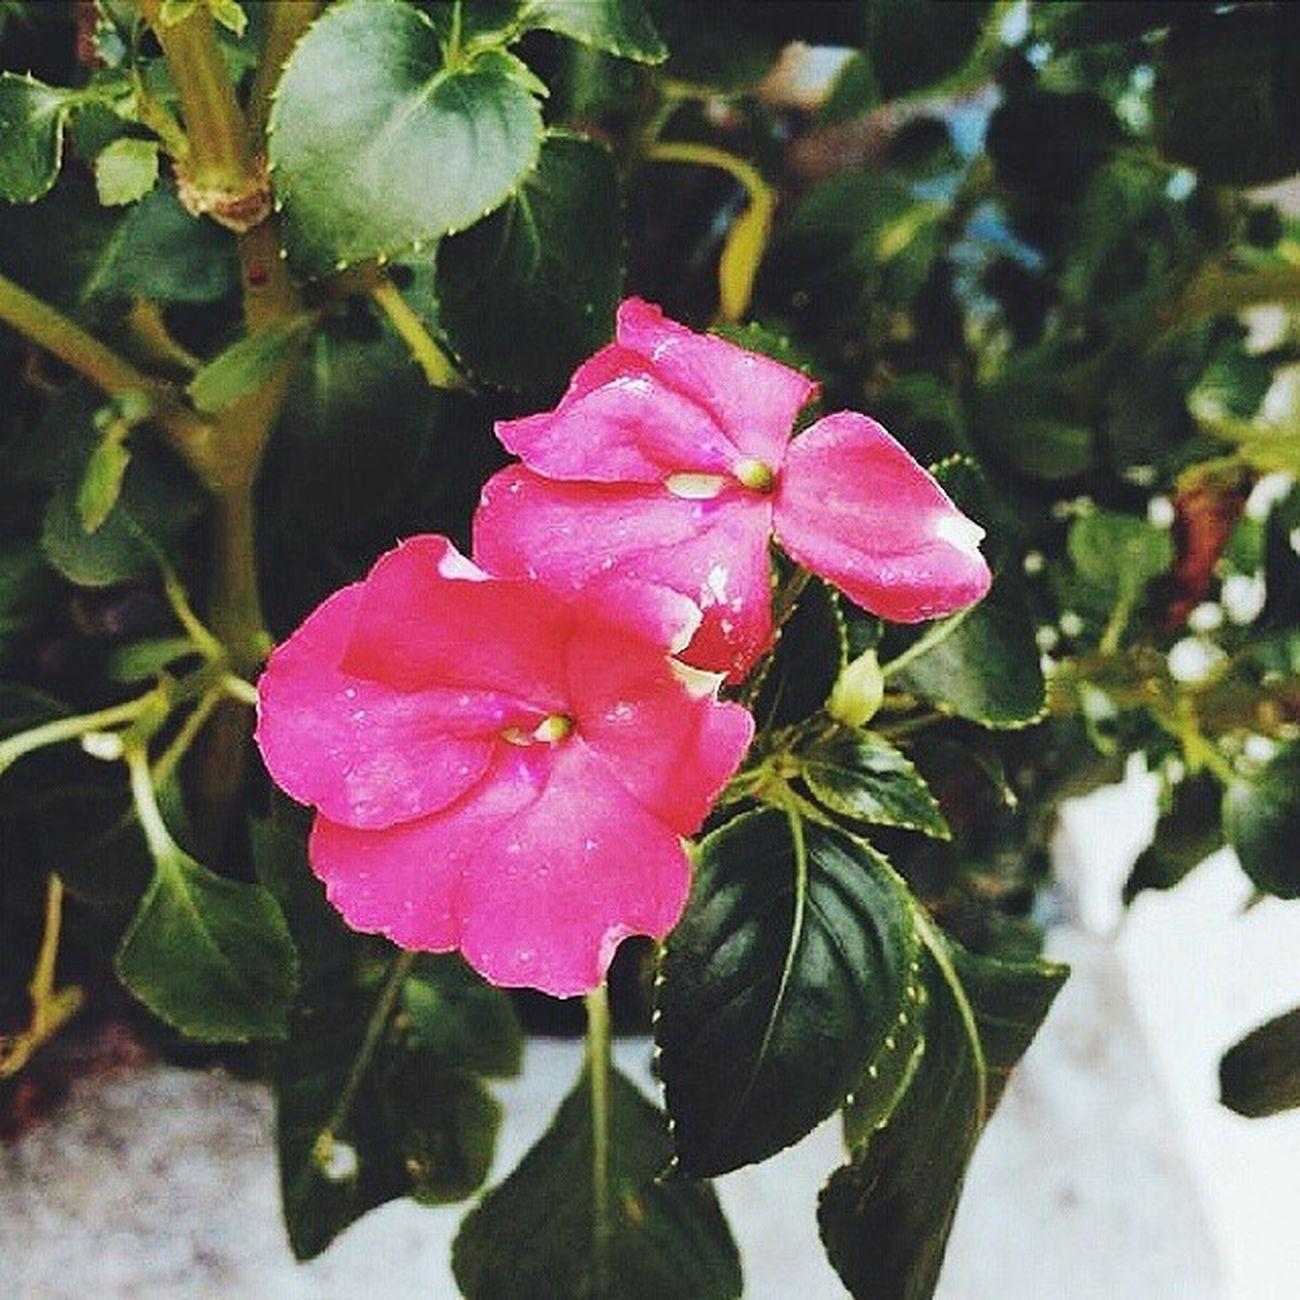 ▪ Vscocam ▪ Vscofeatures ▪ Vscogaleria ▪ Bestofvsco ▪ vscodaily ▪ vscovibe ▪ vsco ▪ vscophile ▪ flowers ▪ vscobrasil ▪